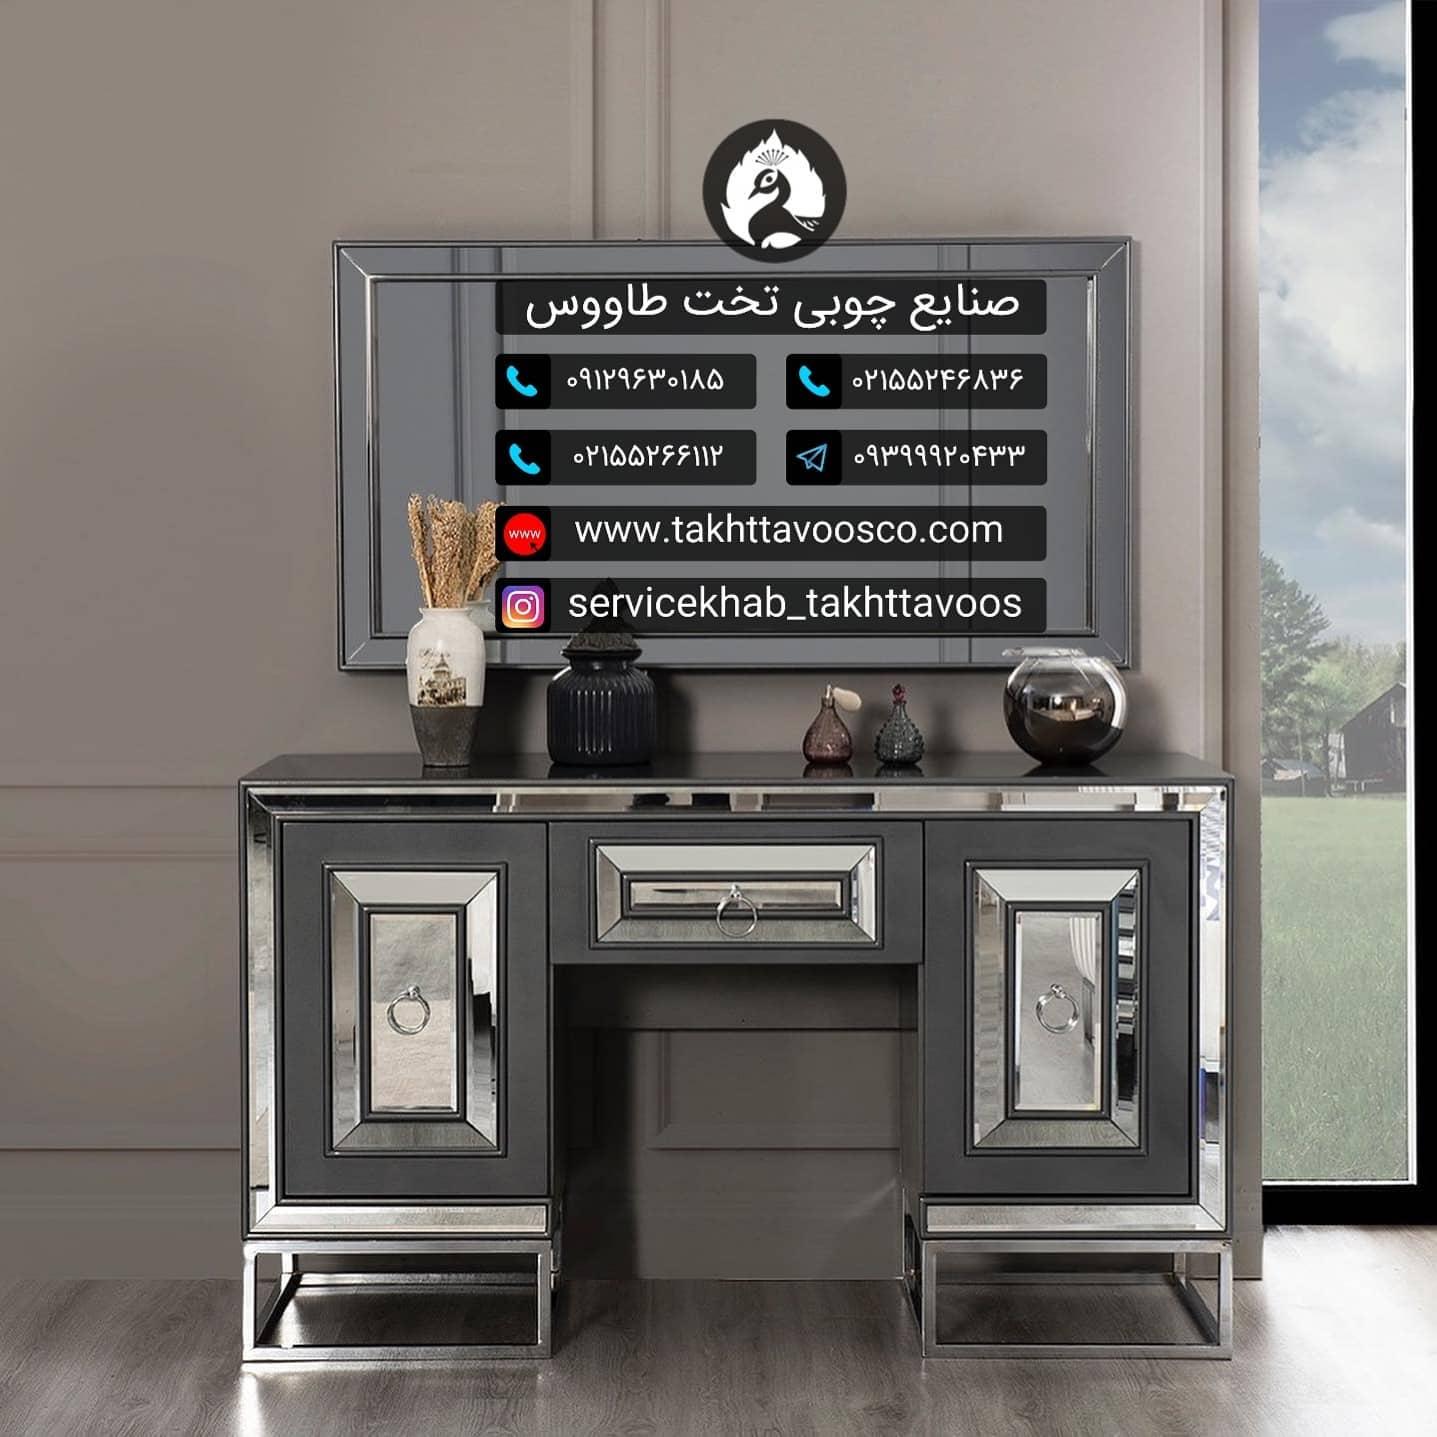 servicekhab_takhttavoos-20210918-0137